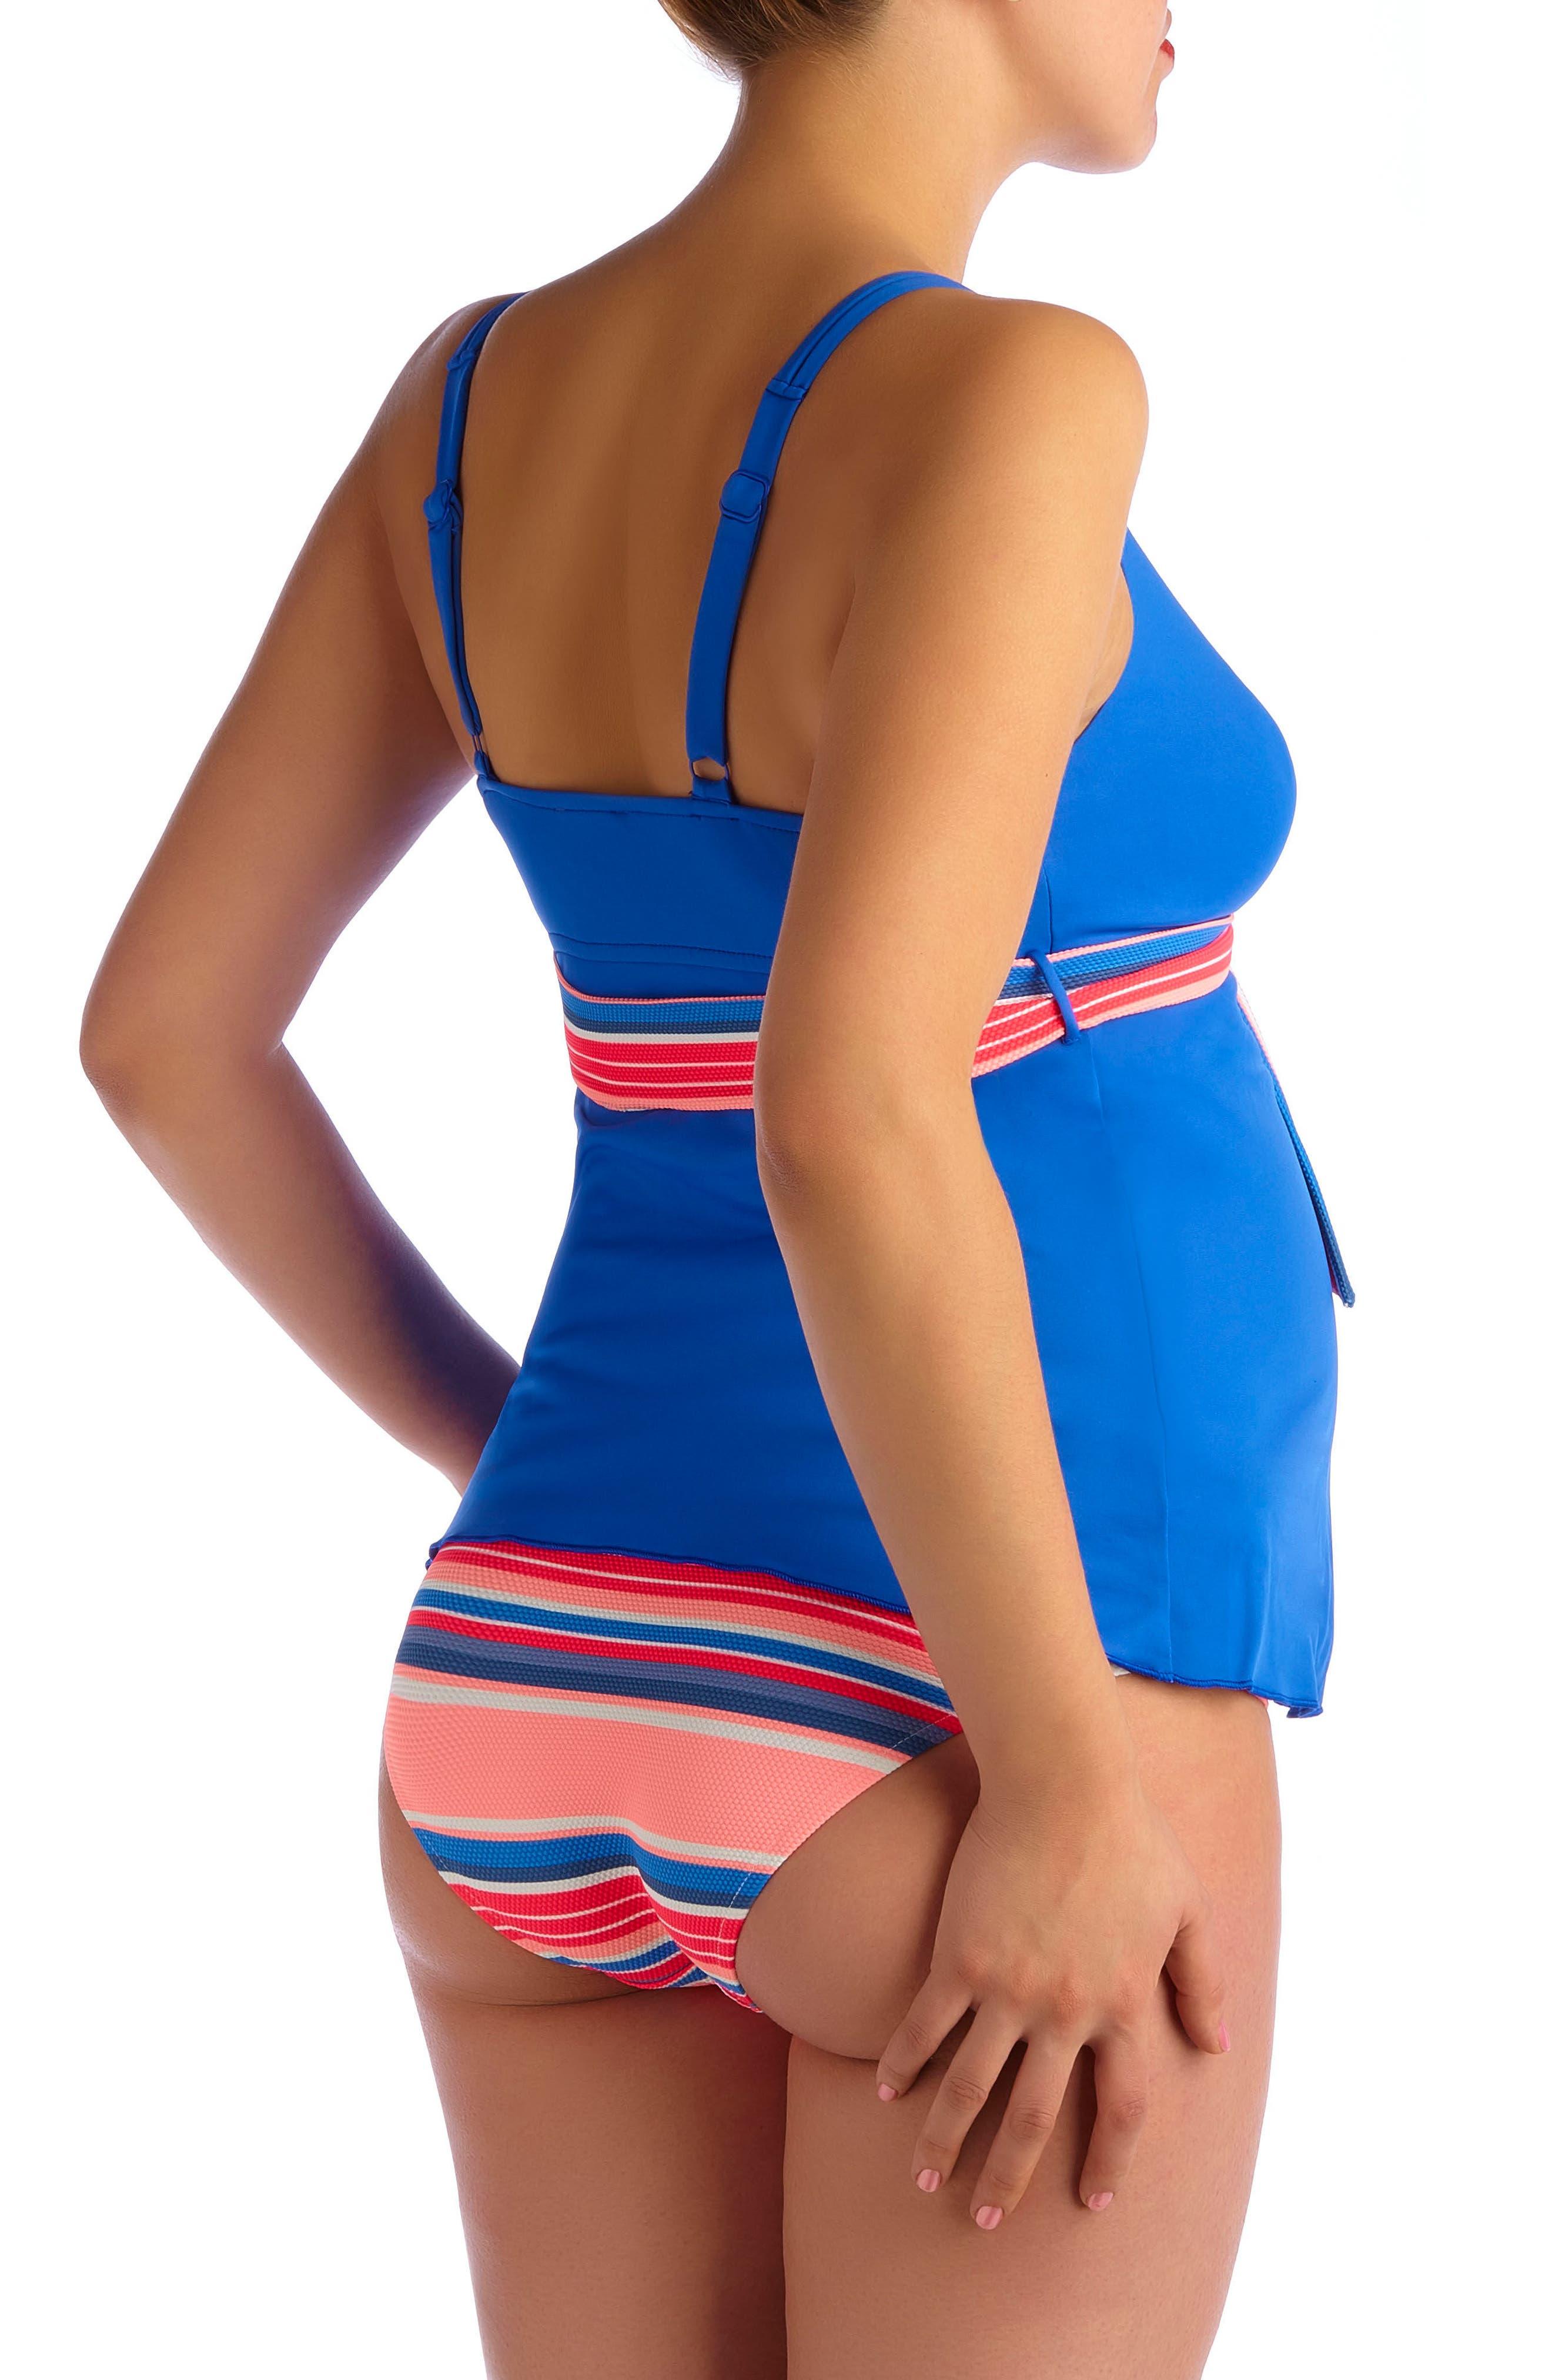 Devon Striped Two-Piece Maternity Swimsuit,                             Alternate thumbnail 2, color,                             BLUE ROYAL